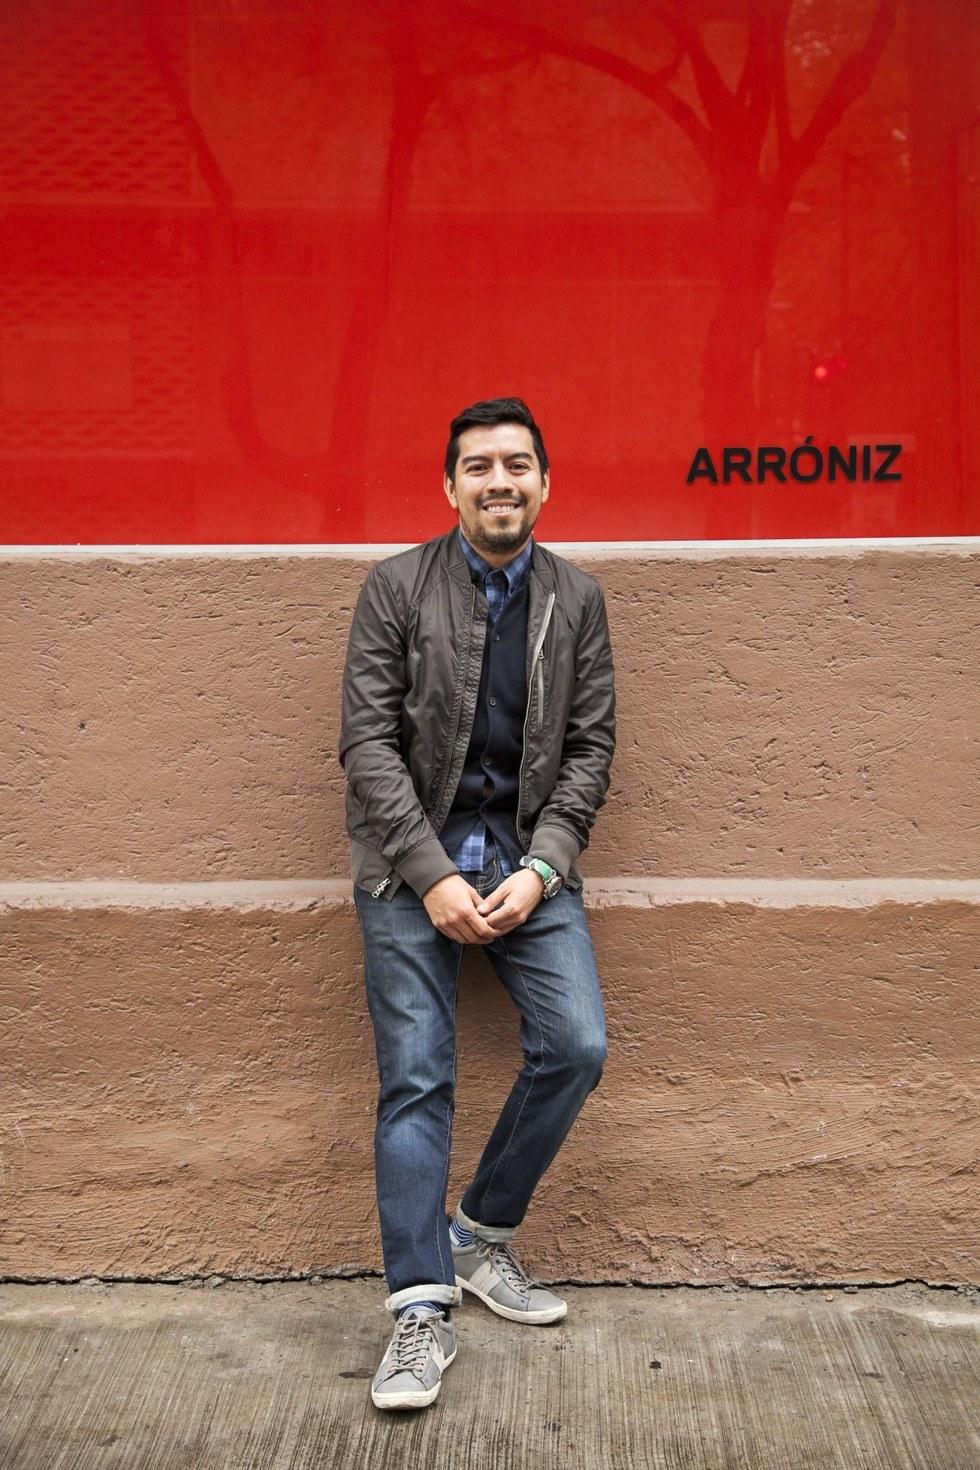 Gustavo Arróniz, gallerist and owner, Arróniz Arte Contemporáneo